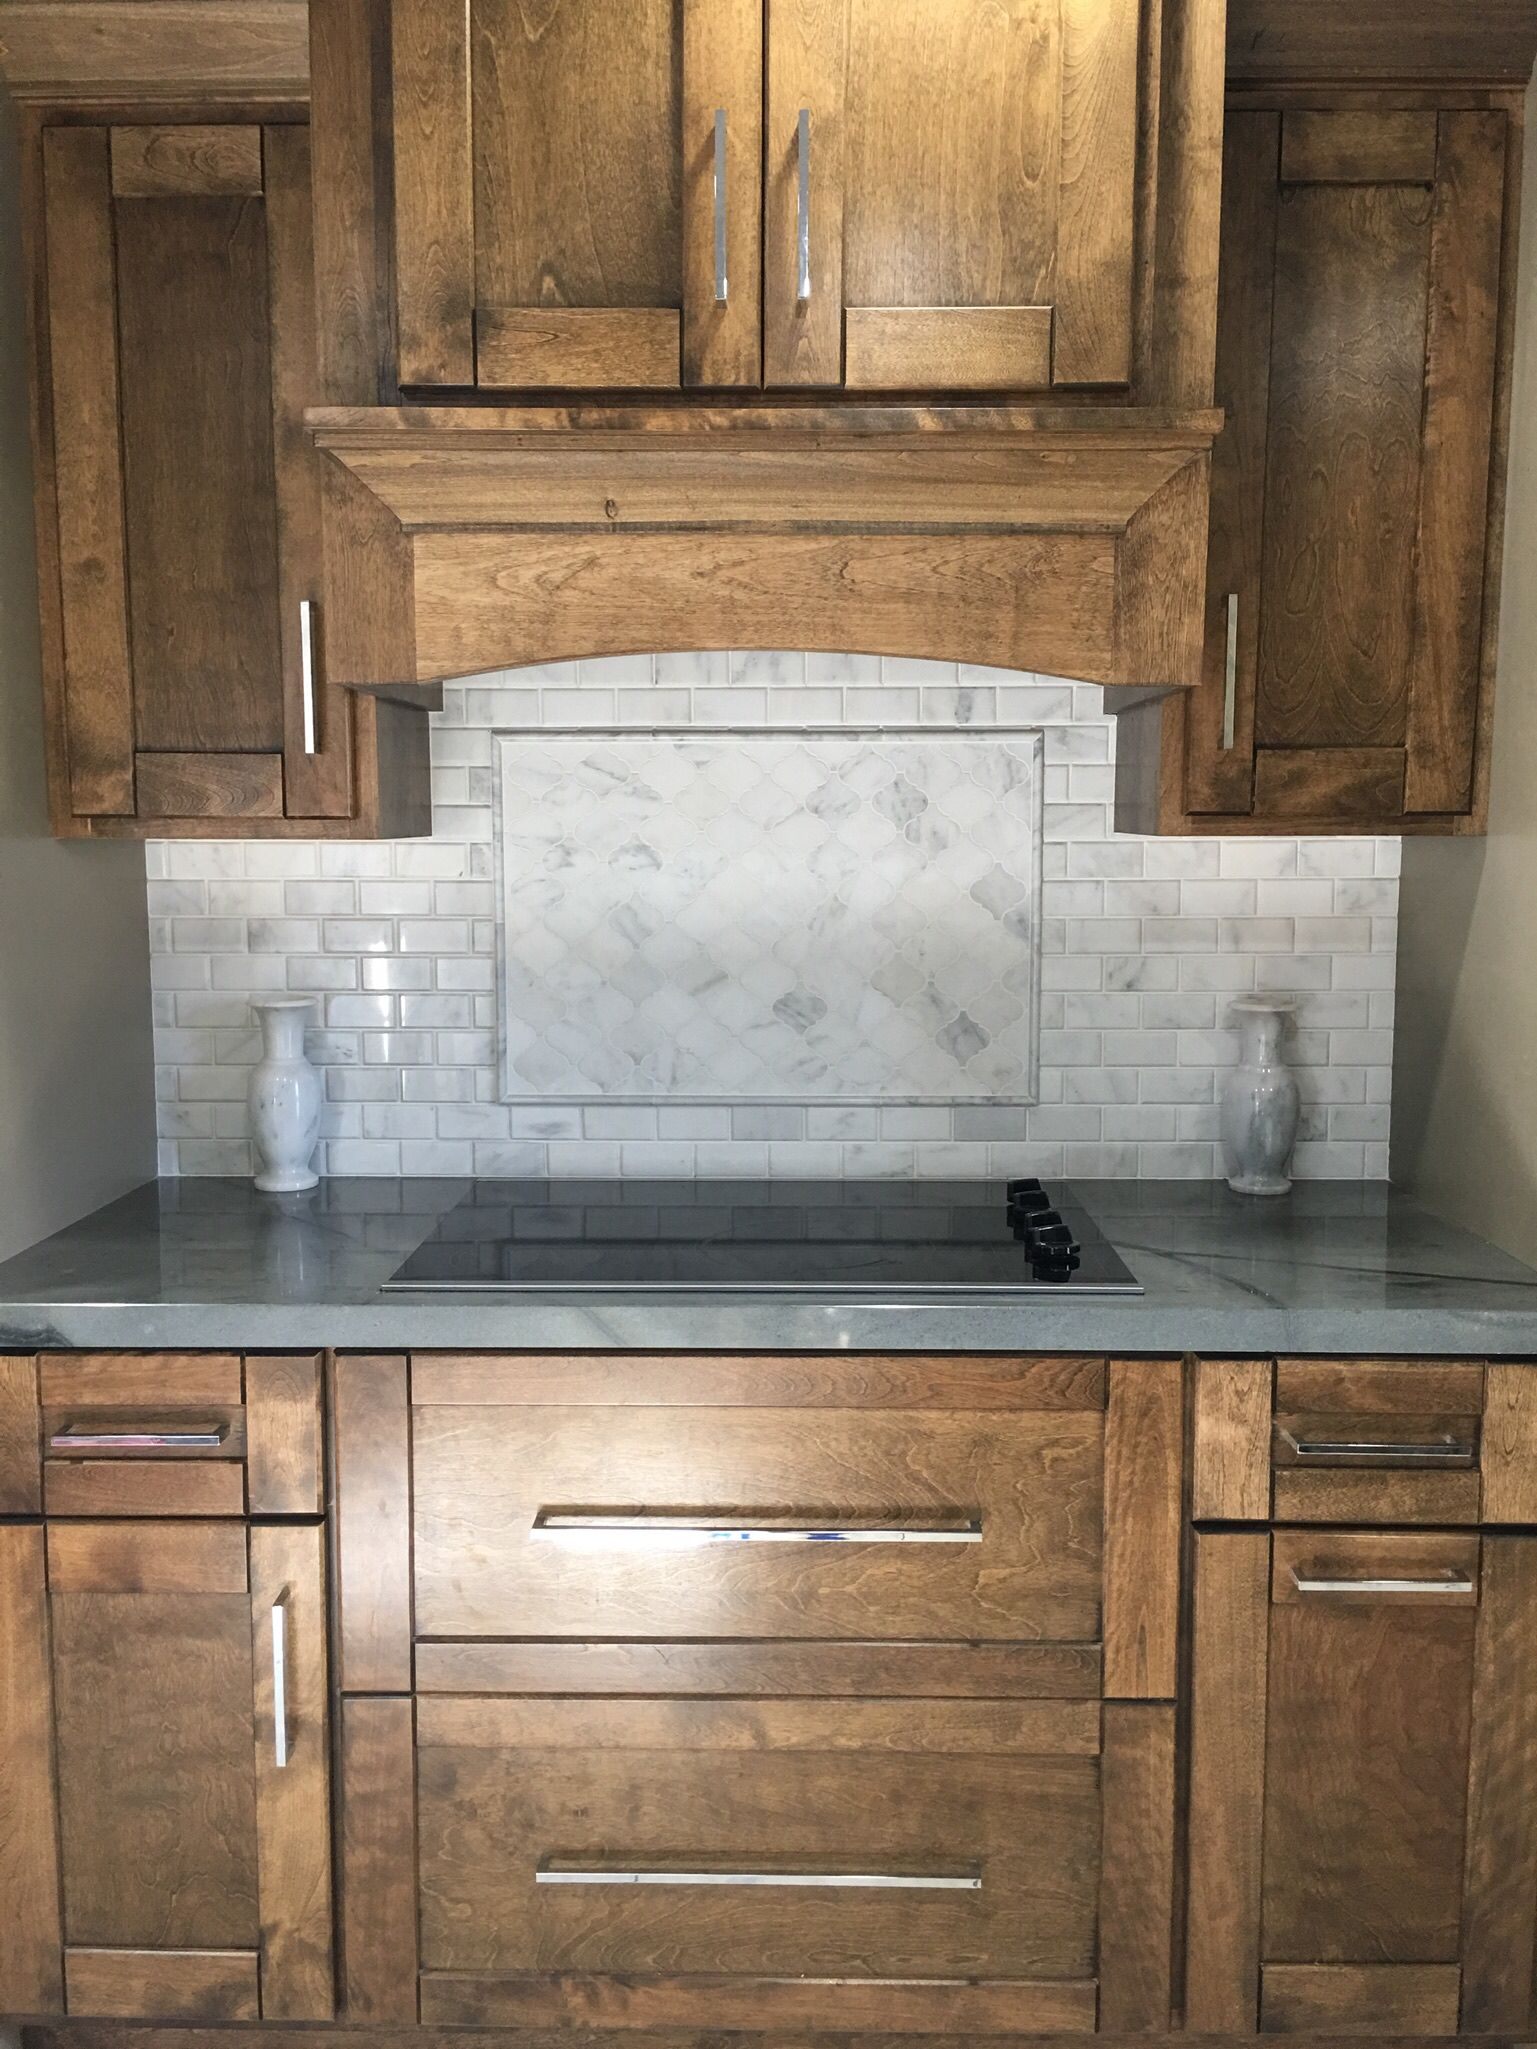 The Venato Carrara Marble Brick tiling used